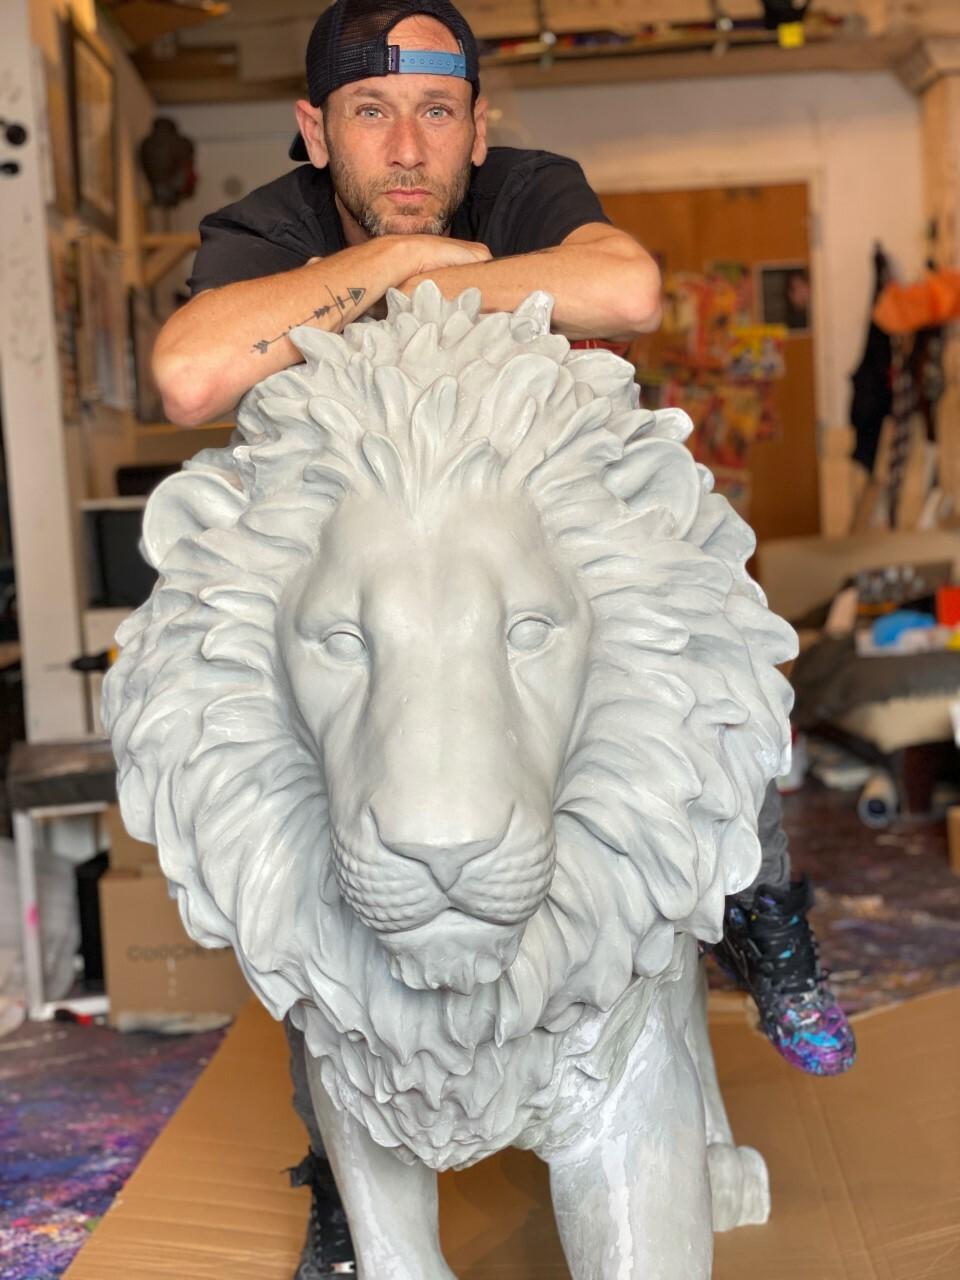 Jeremy Penn with his lion sculpture.